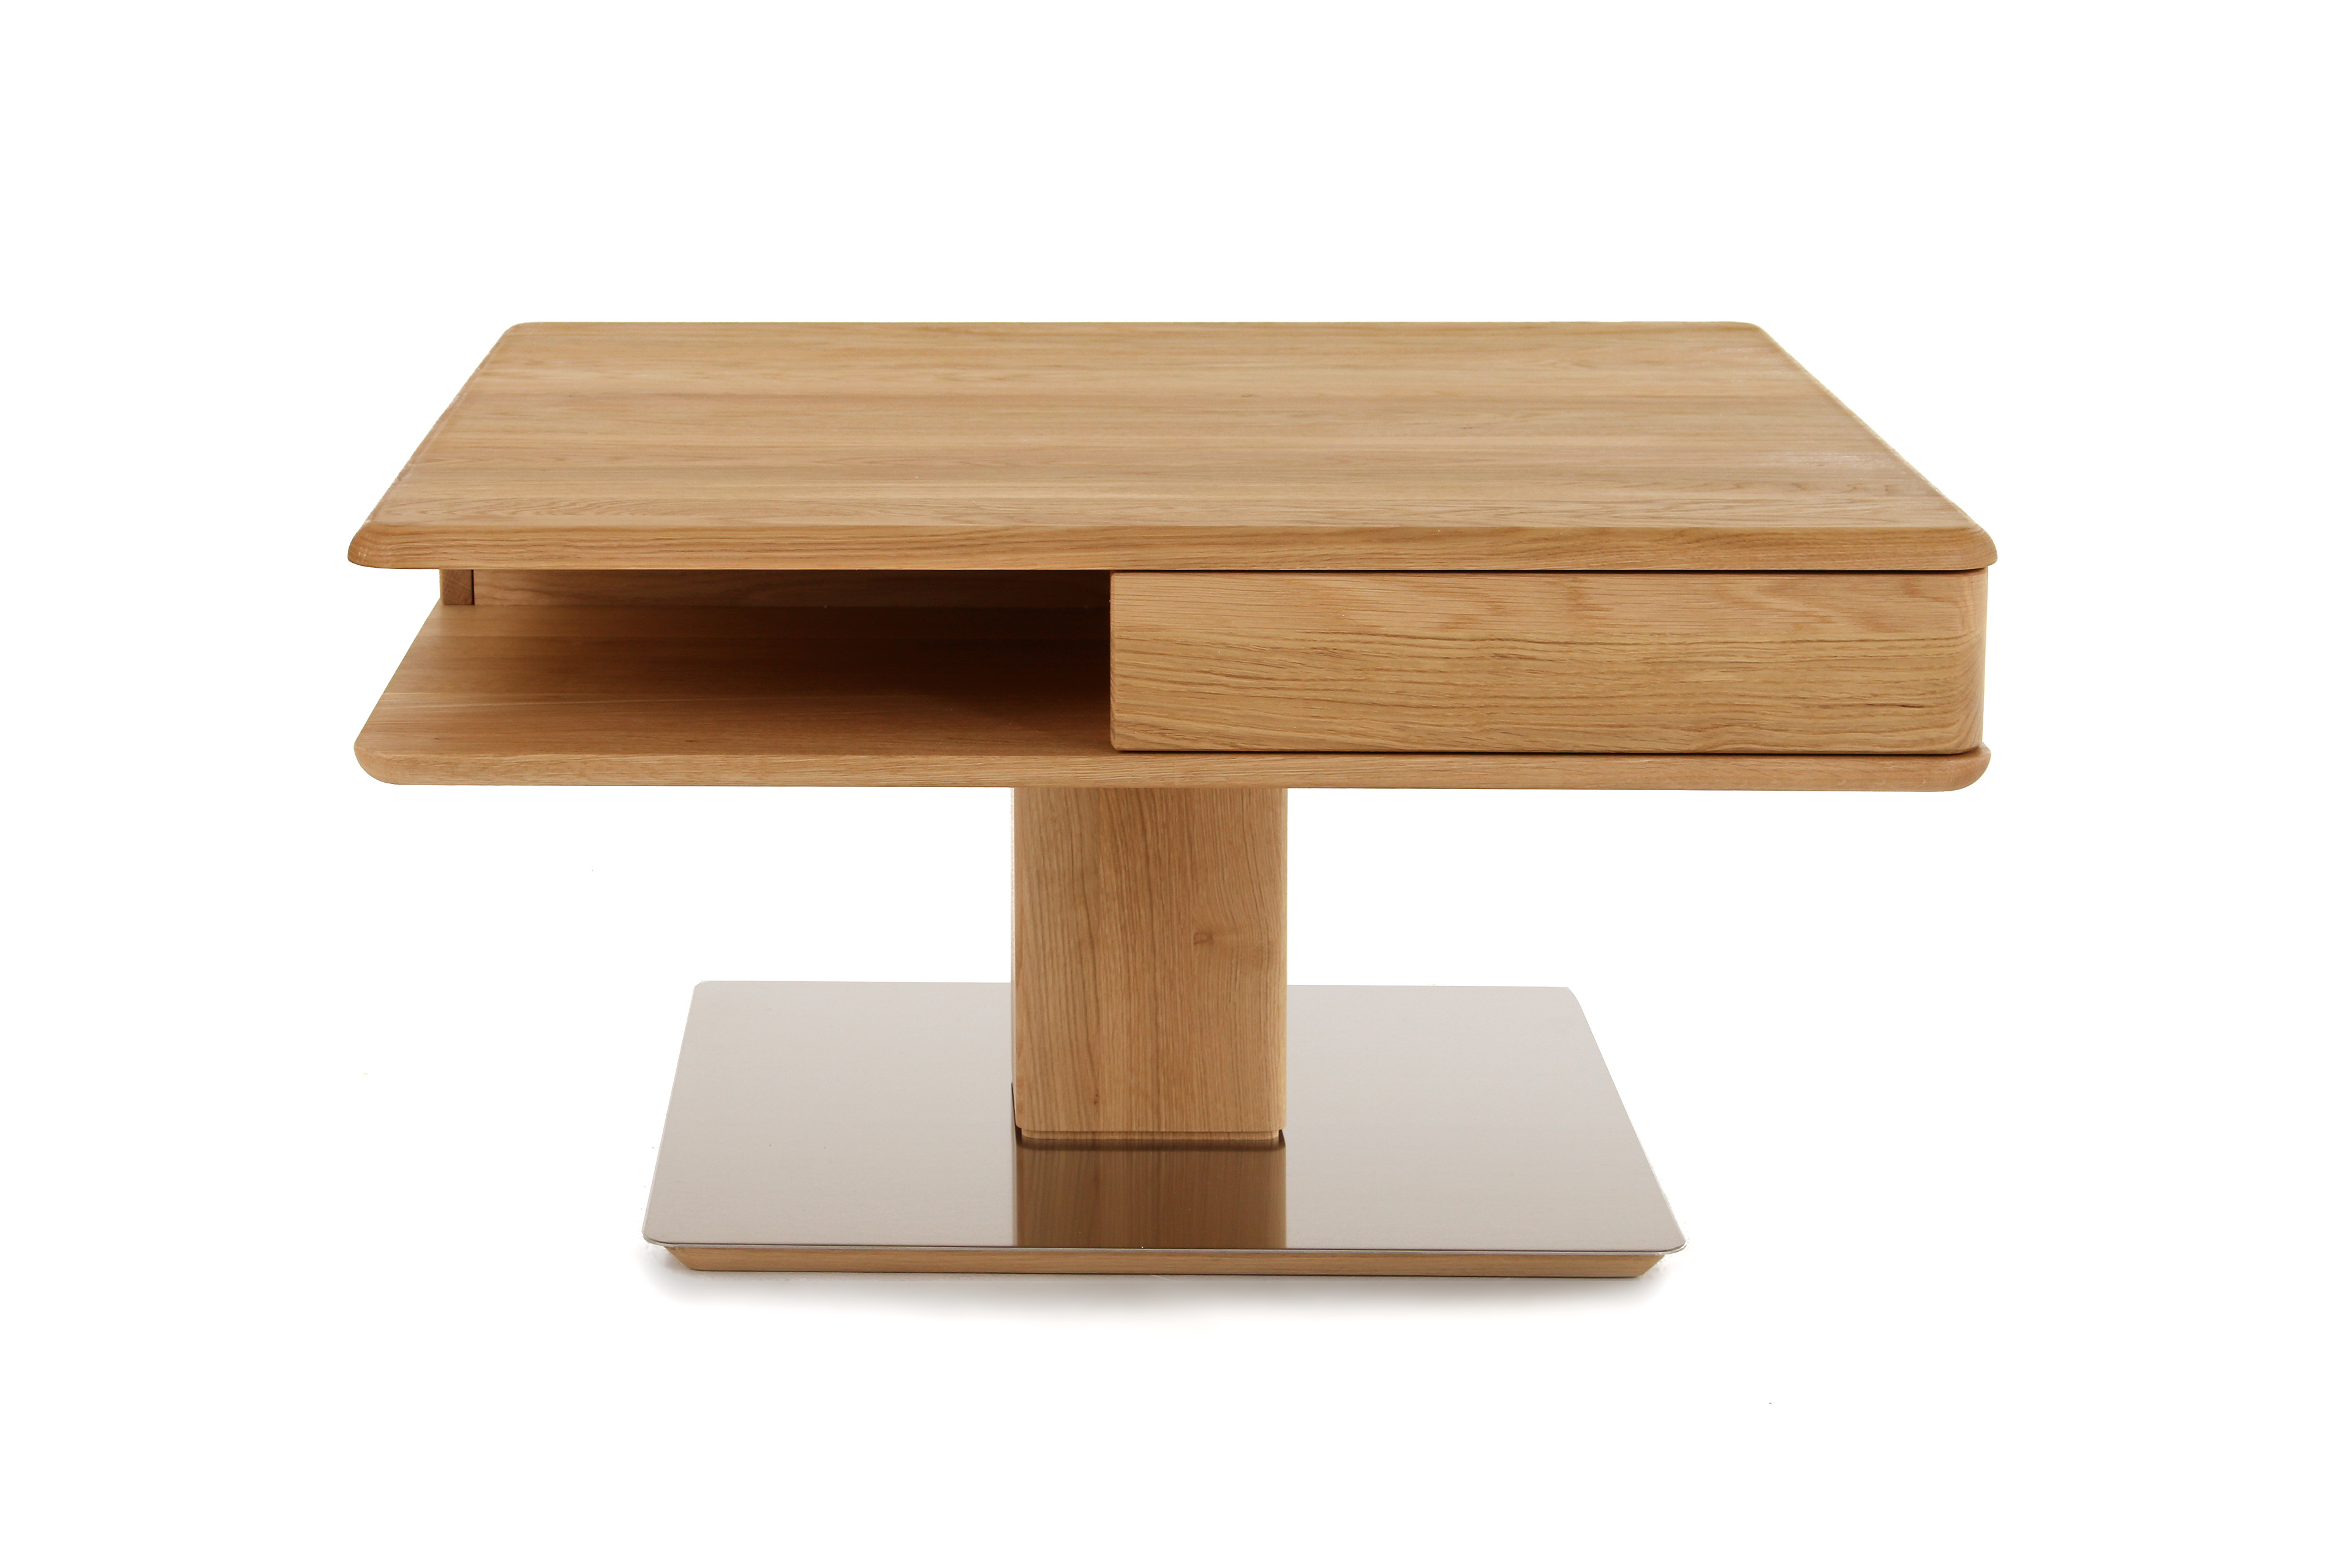 woodlive quadro couchtisch 52011000 m bel letz ihr online shop. Black Bedroom Furniture Sets. Home Design Ideas